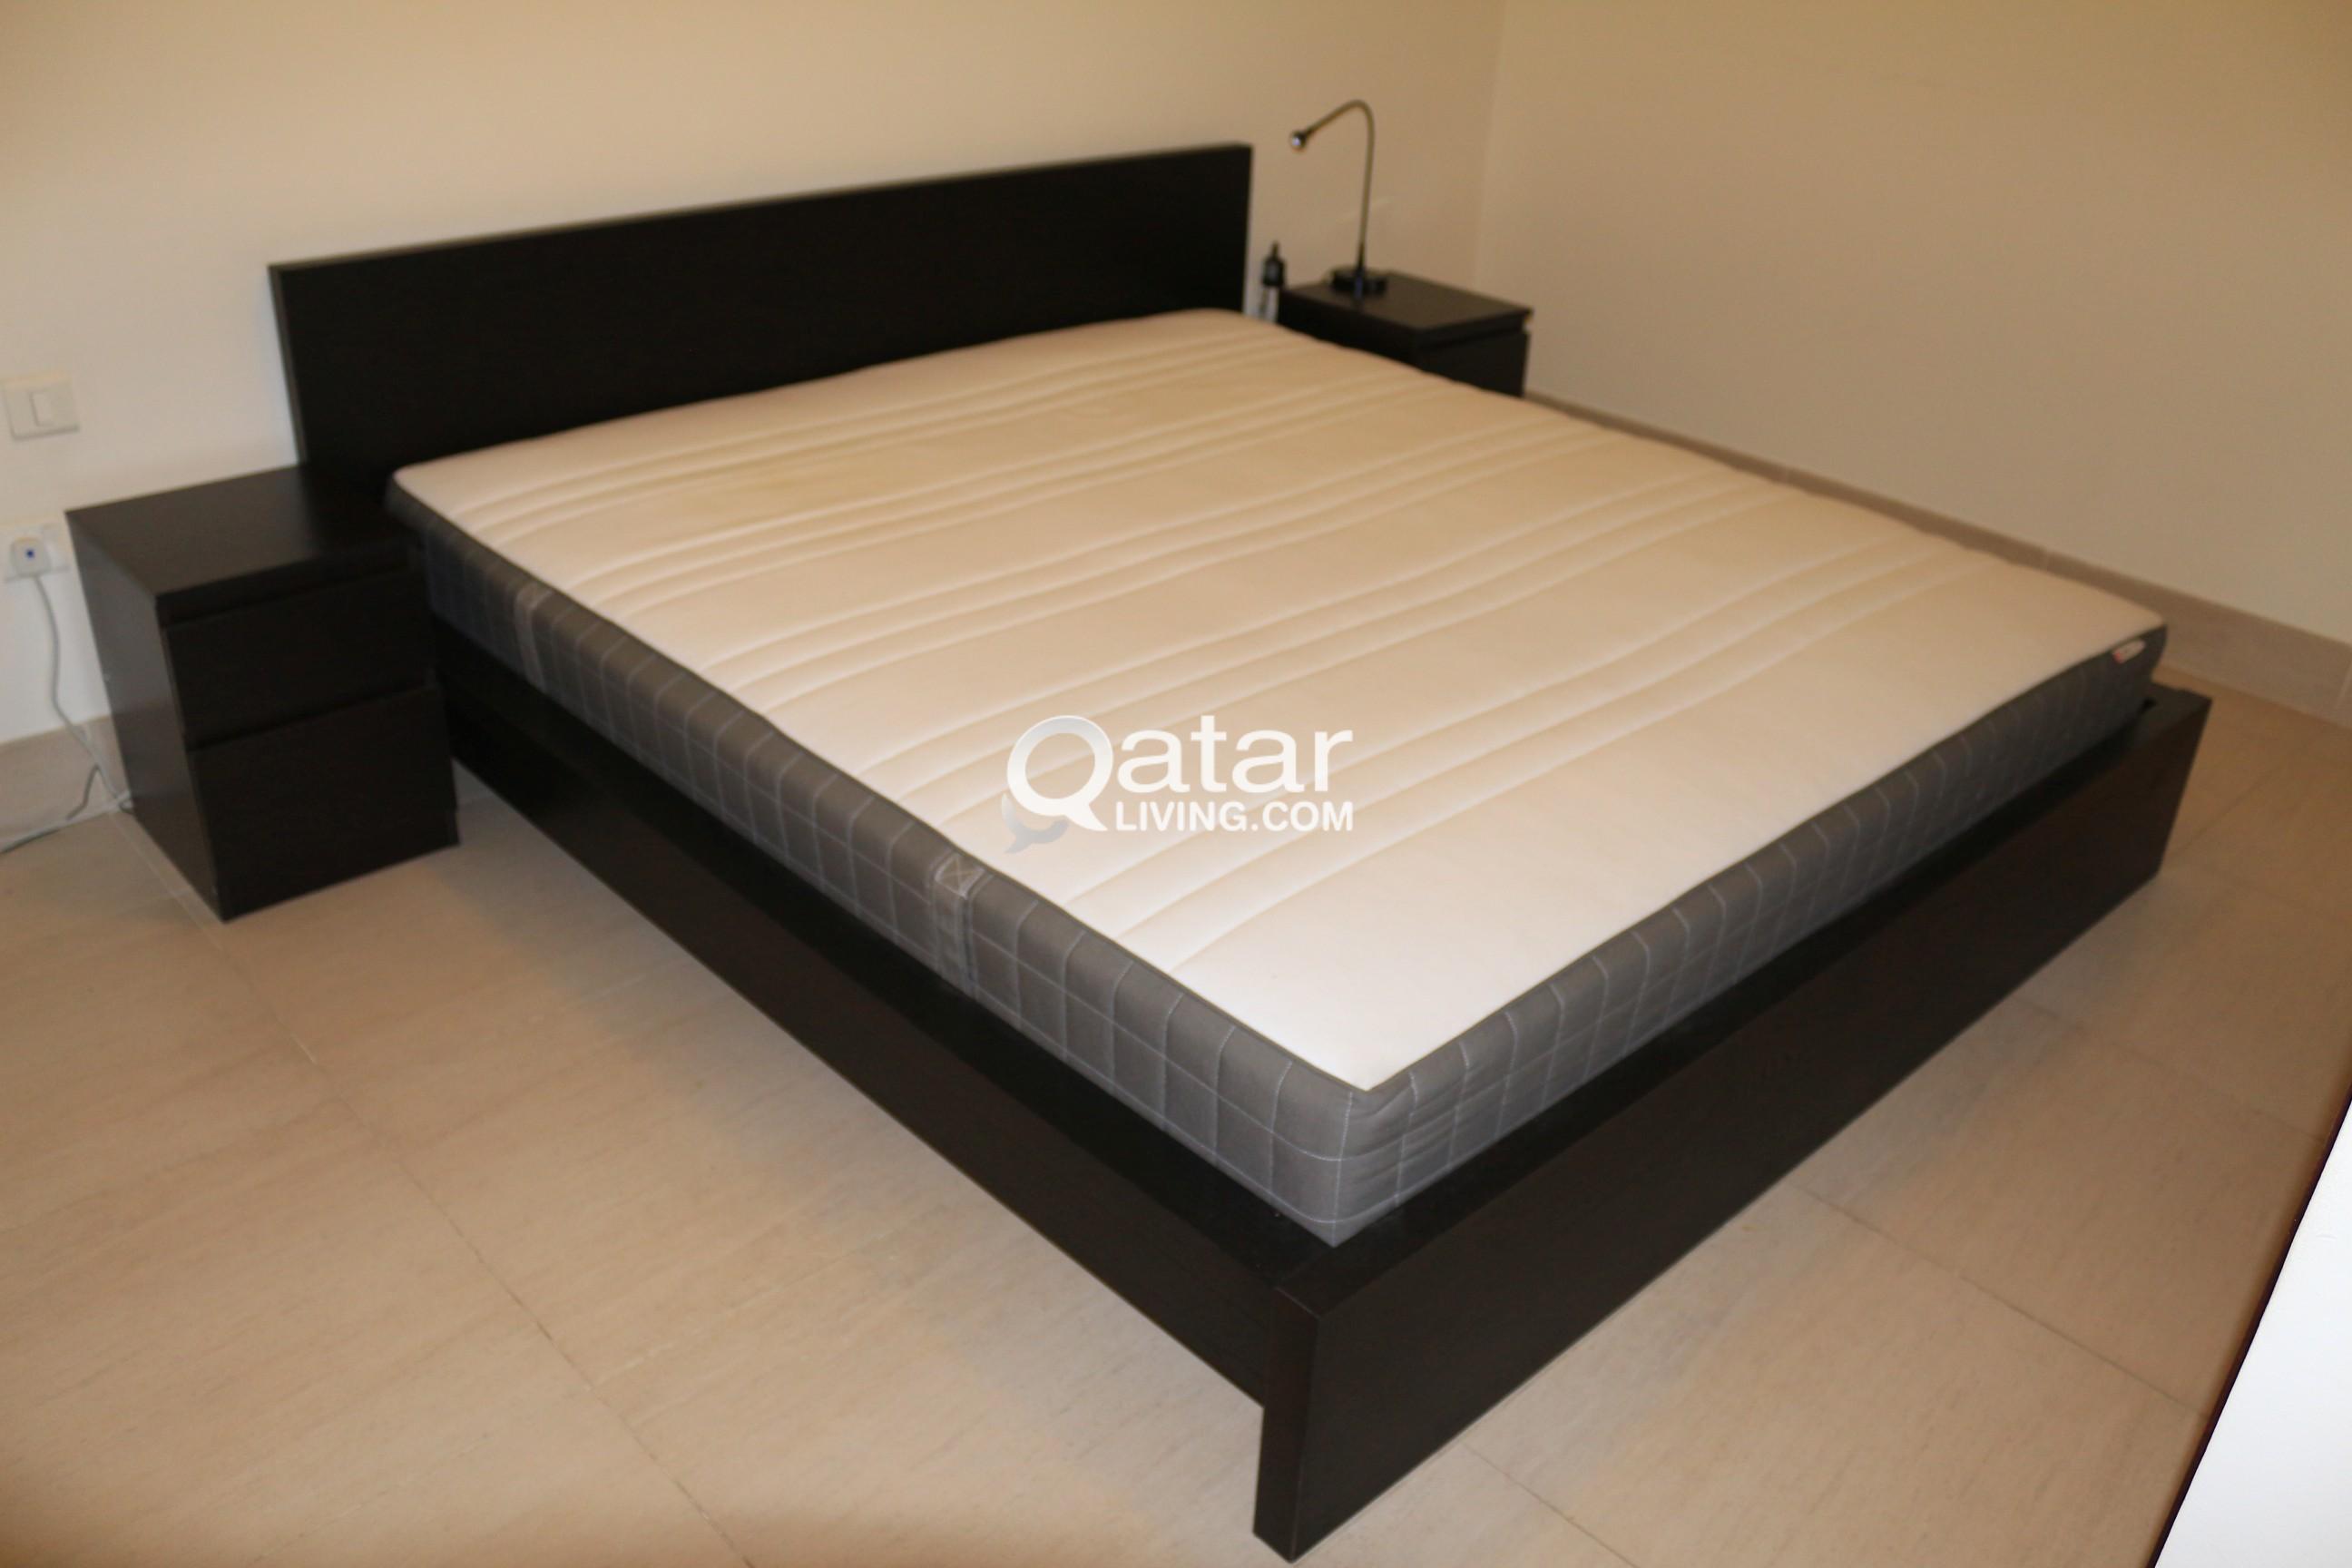 Ikea Malm Bed King Size Sprung Mattress Qatar Living